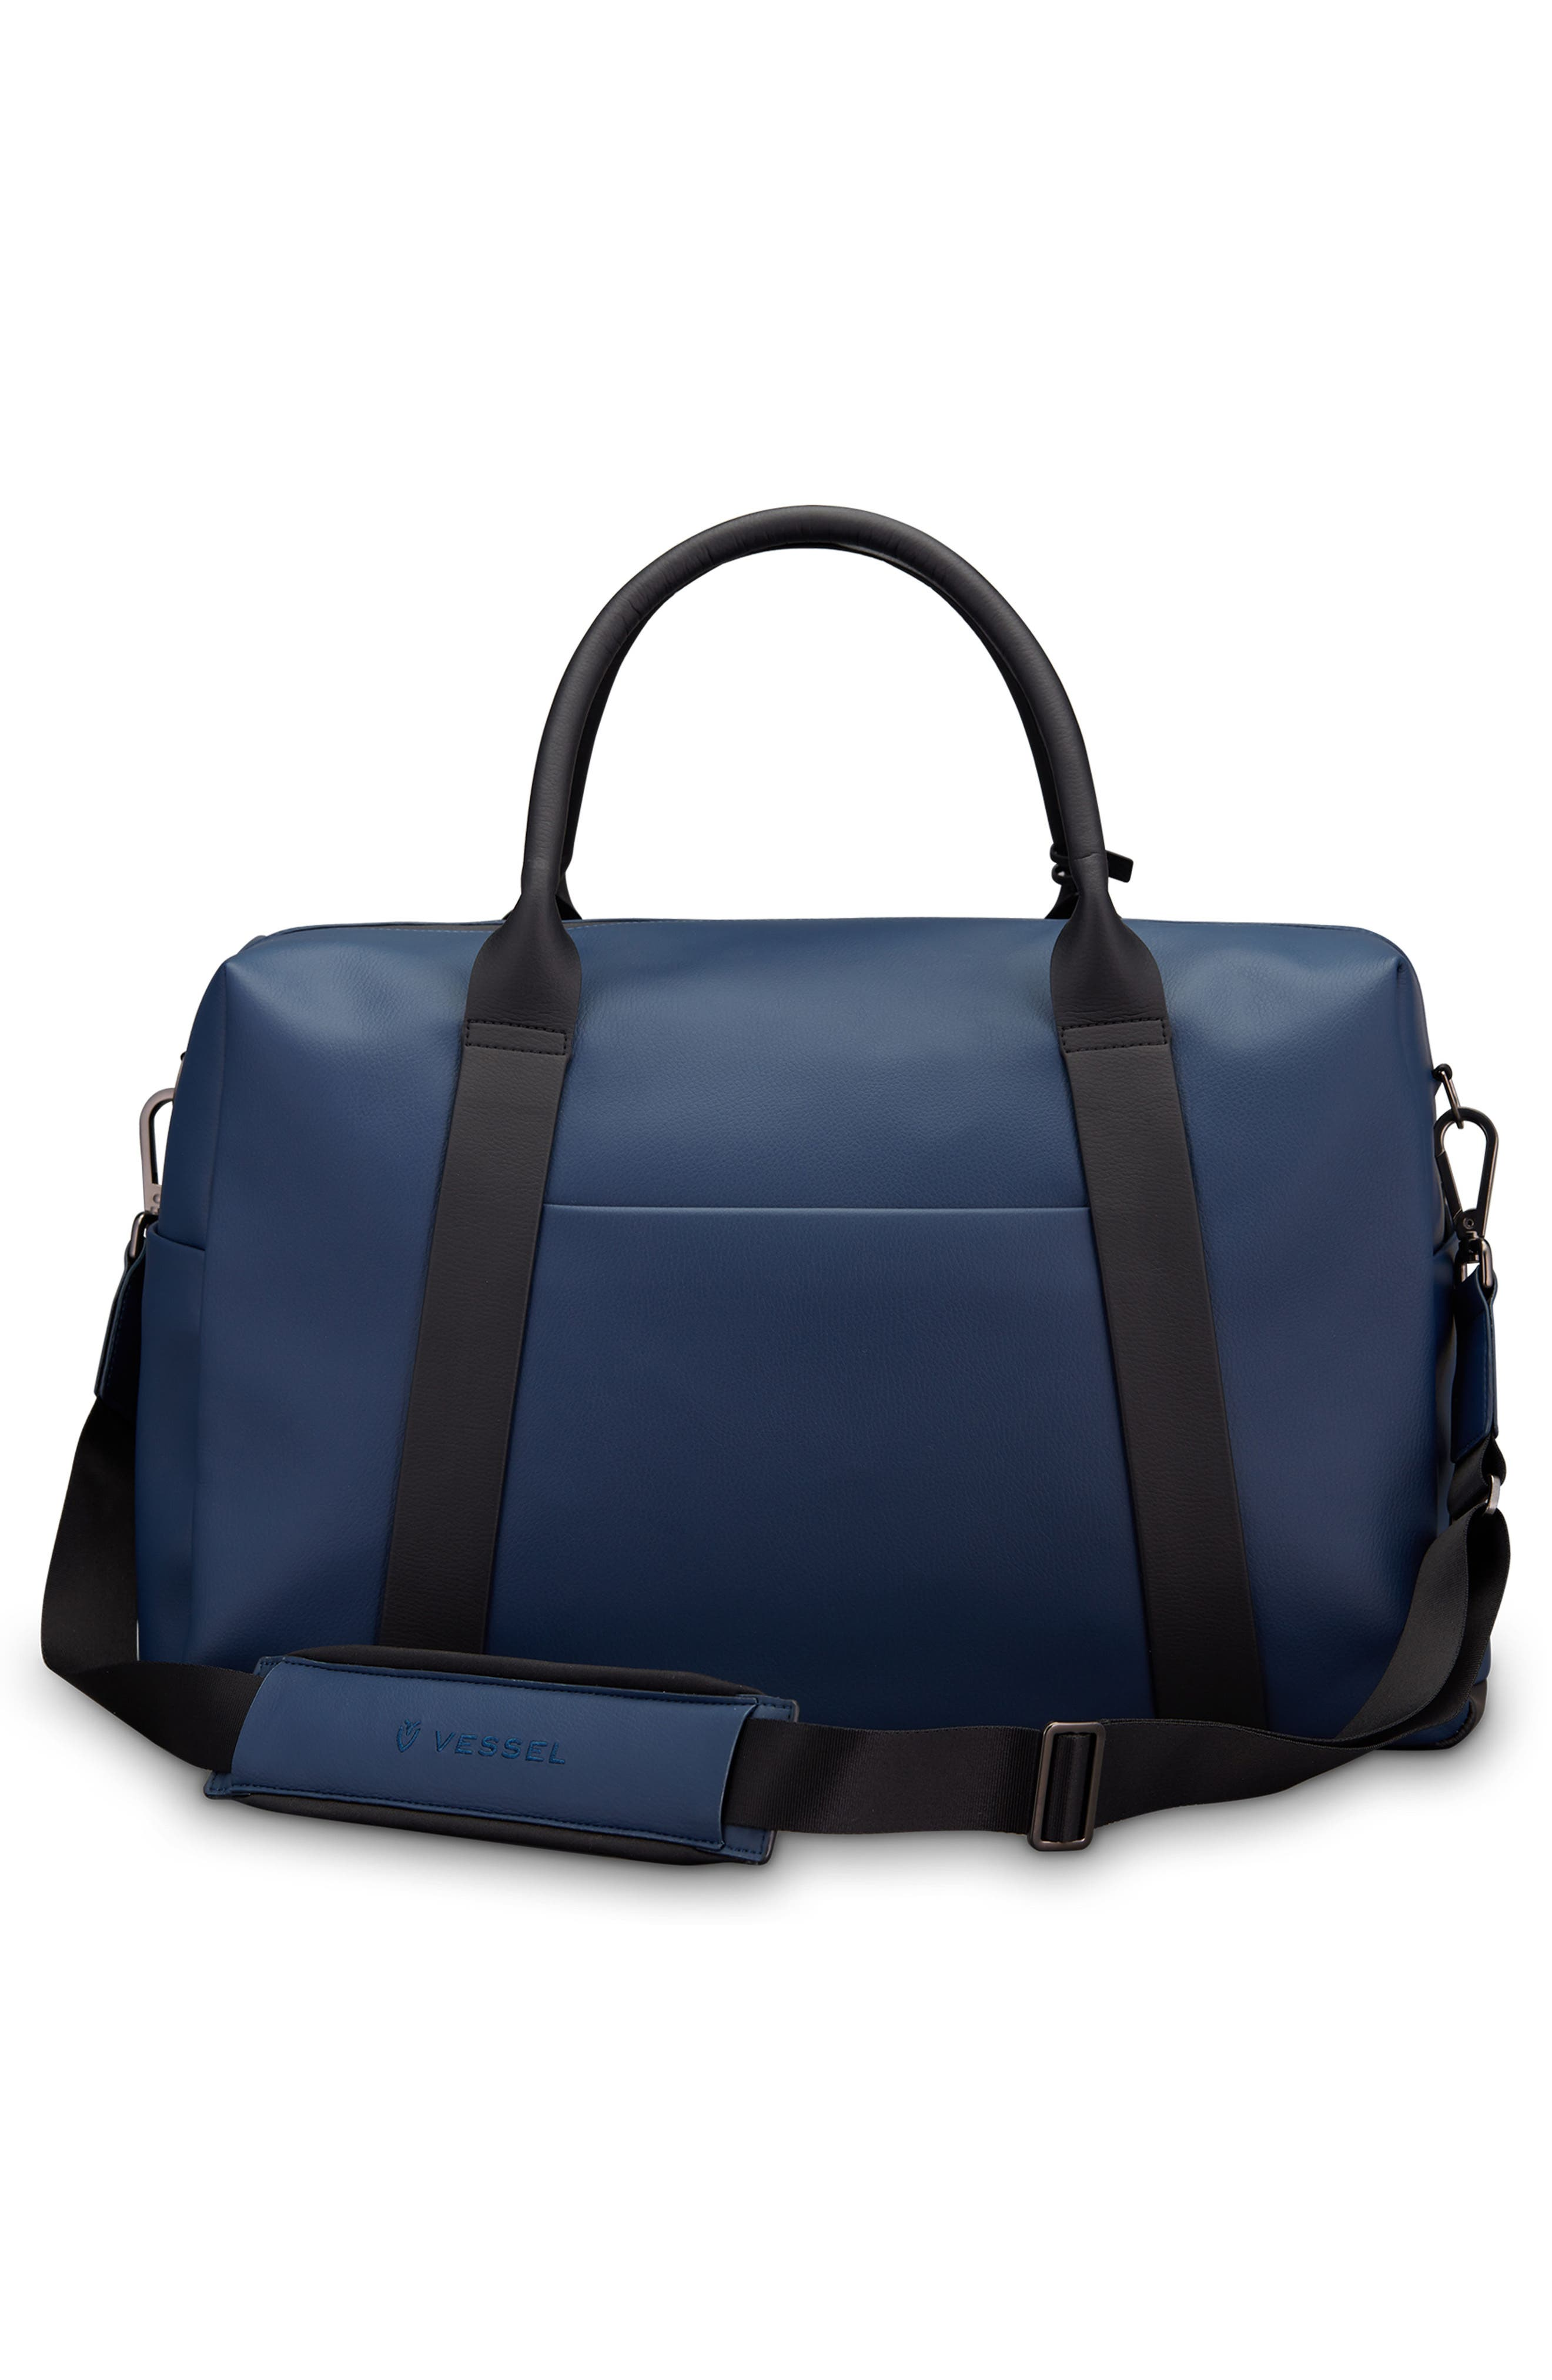 Signature 2.0 Faux Leather Duffel Bag,                             Alternate thumbnail 2, color,                             PEBBLED NAVY/ BLACK